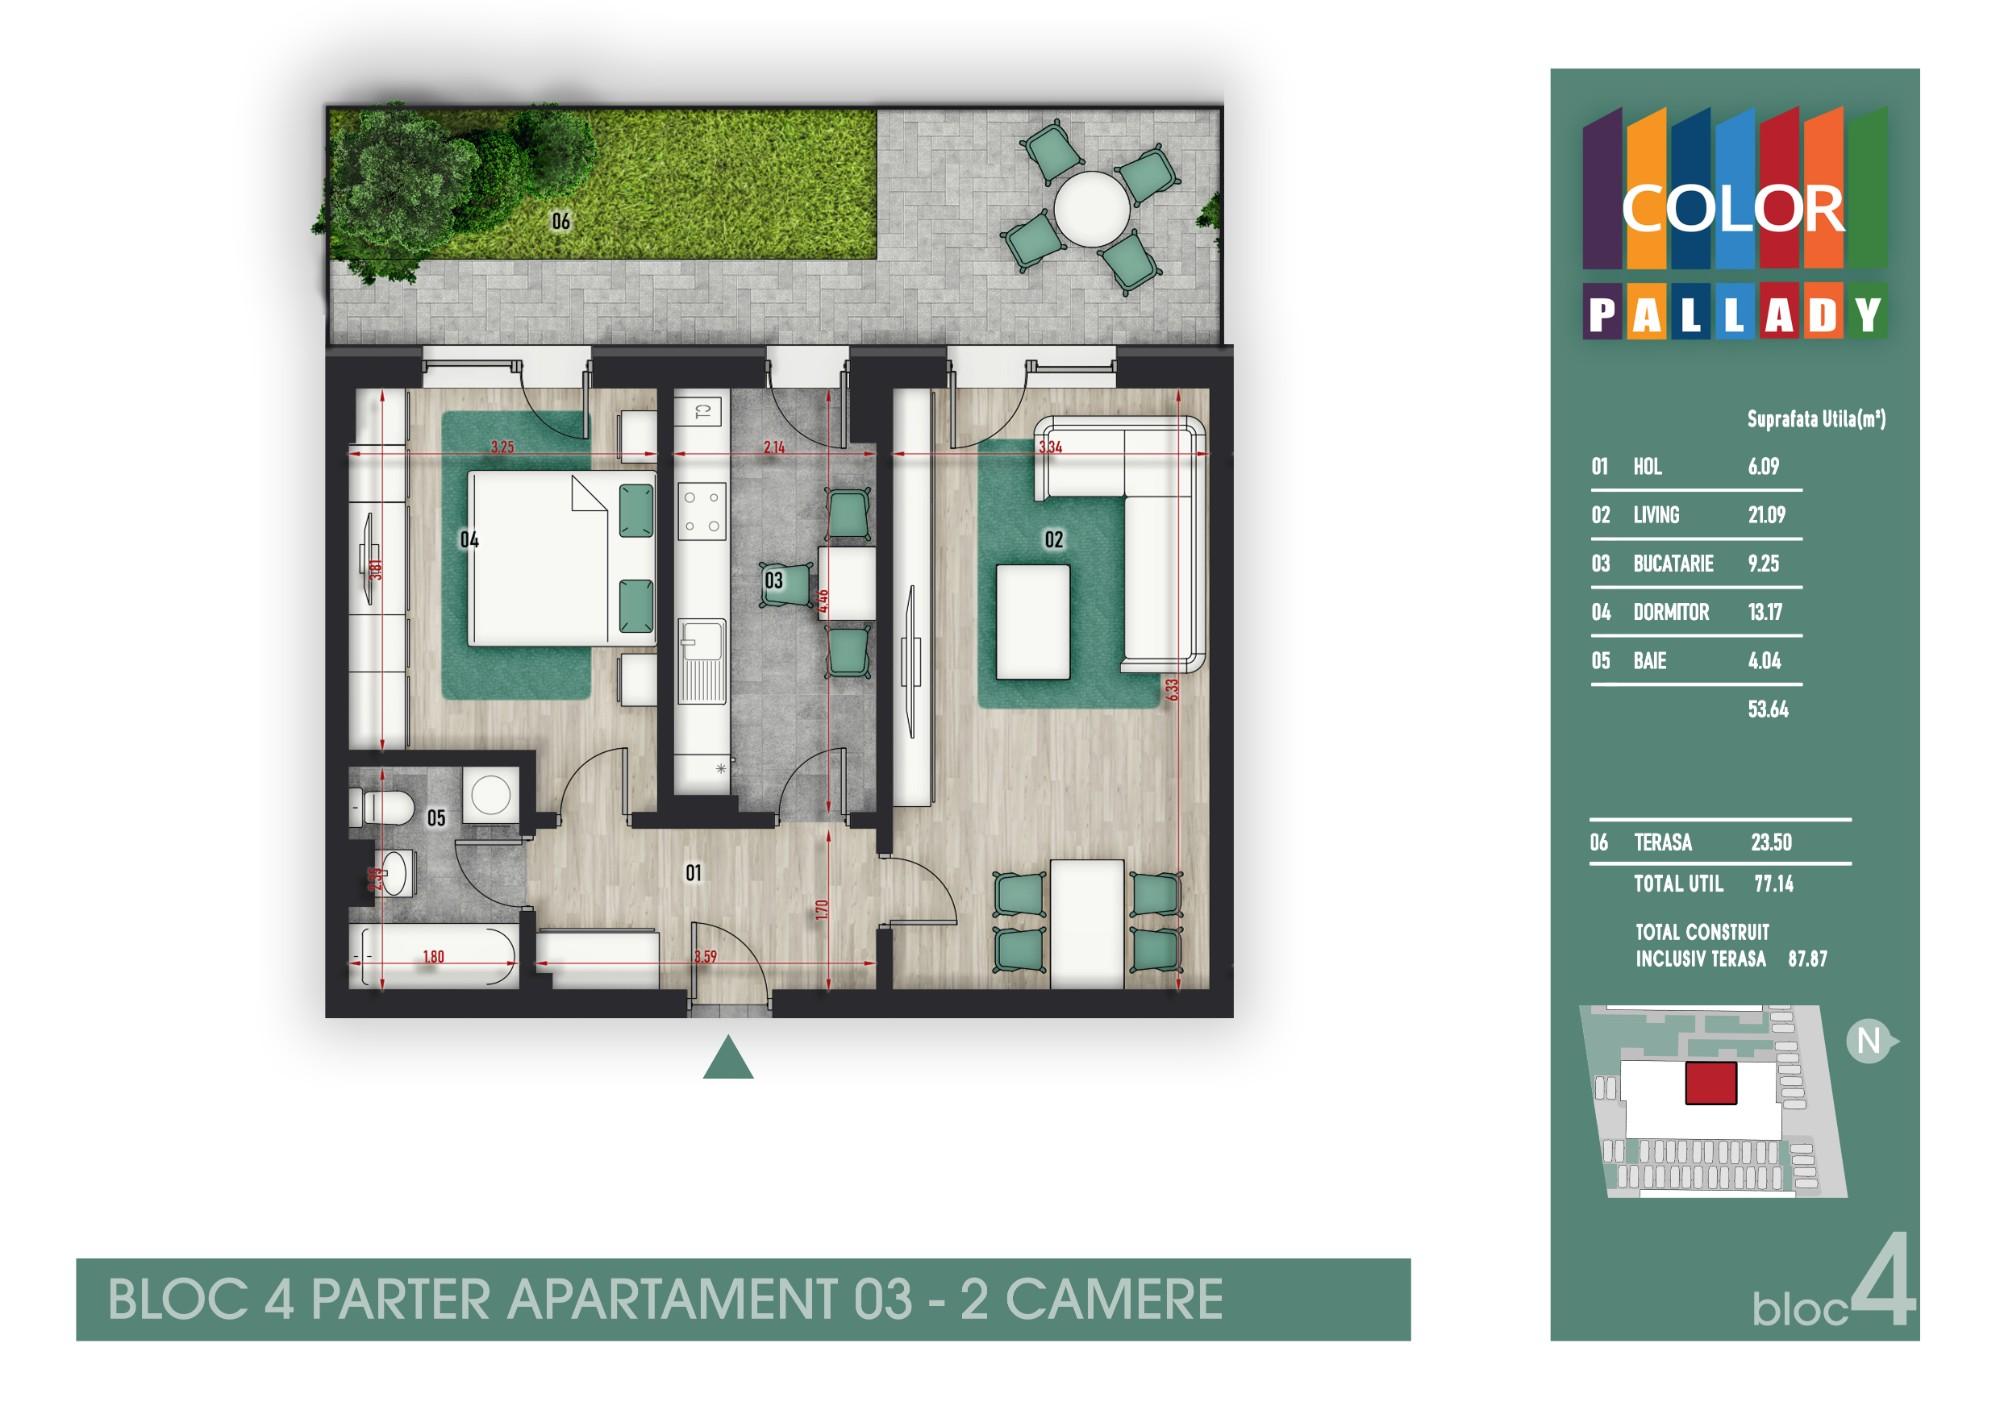 Bloc 4 - Parter - Apartament 03